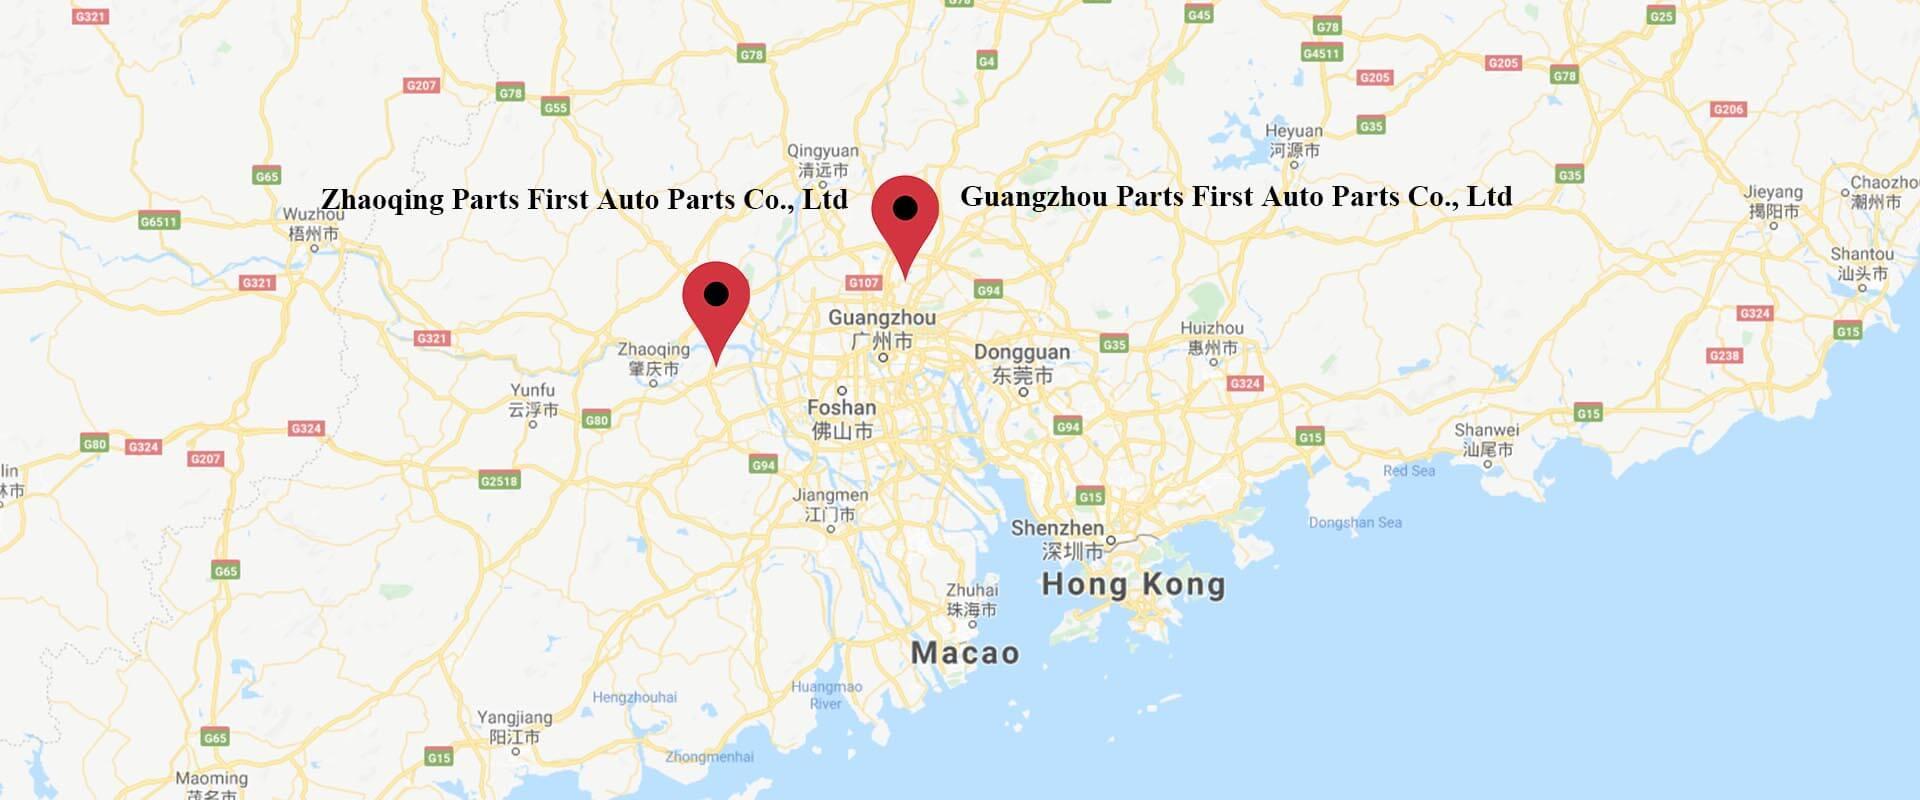 Partsfirst-Location